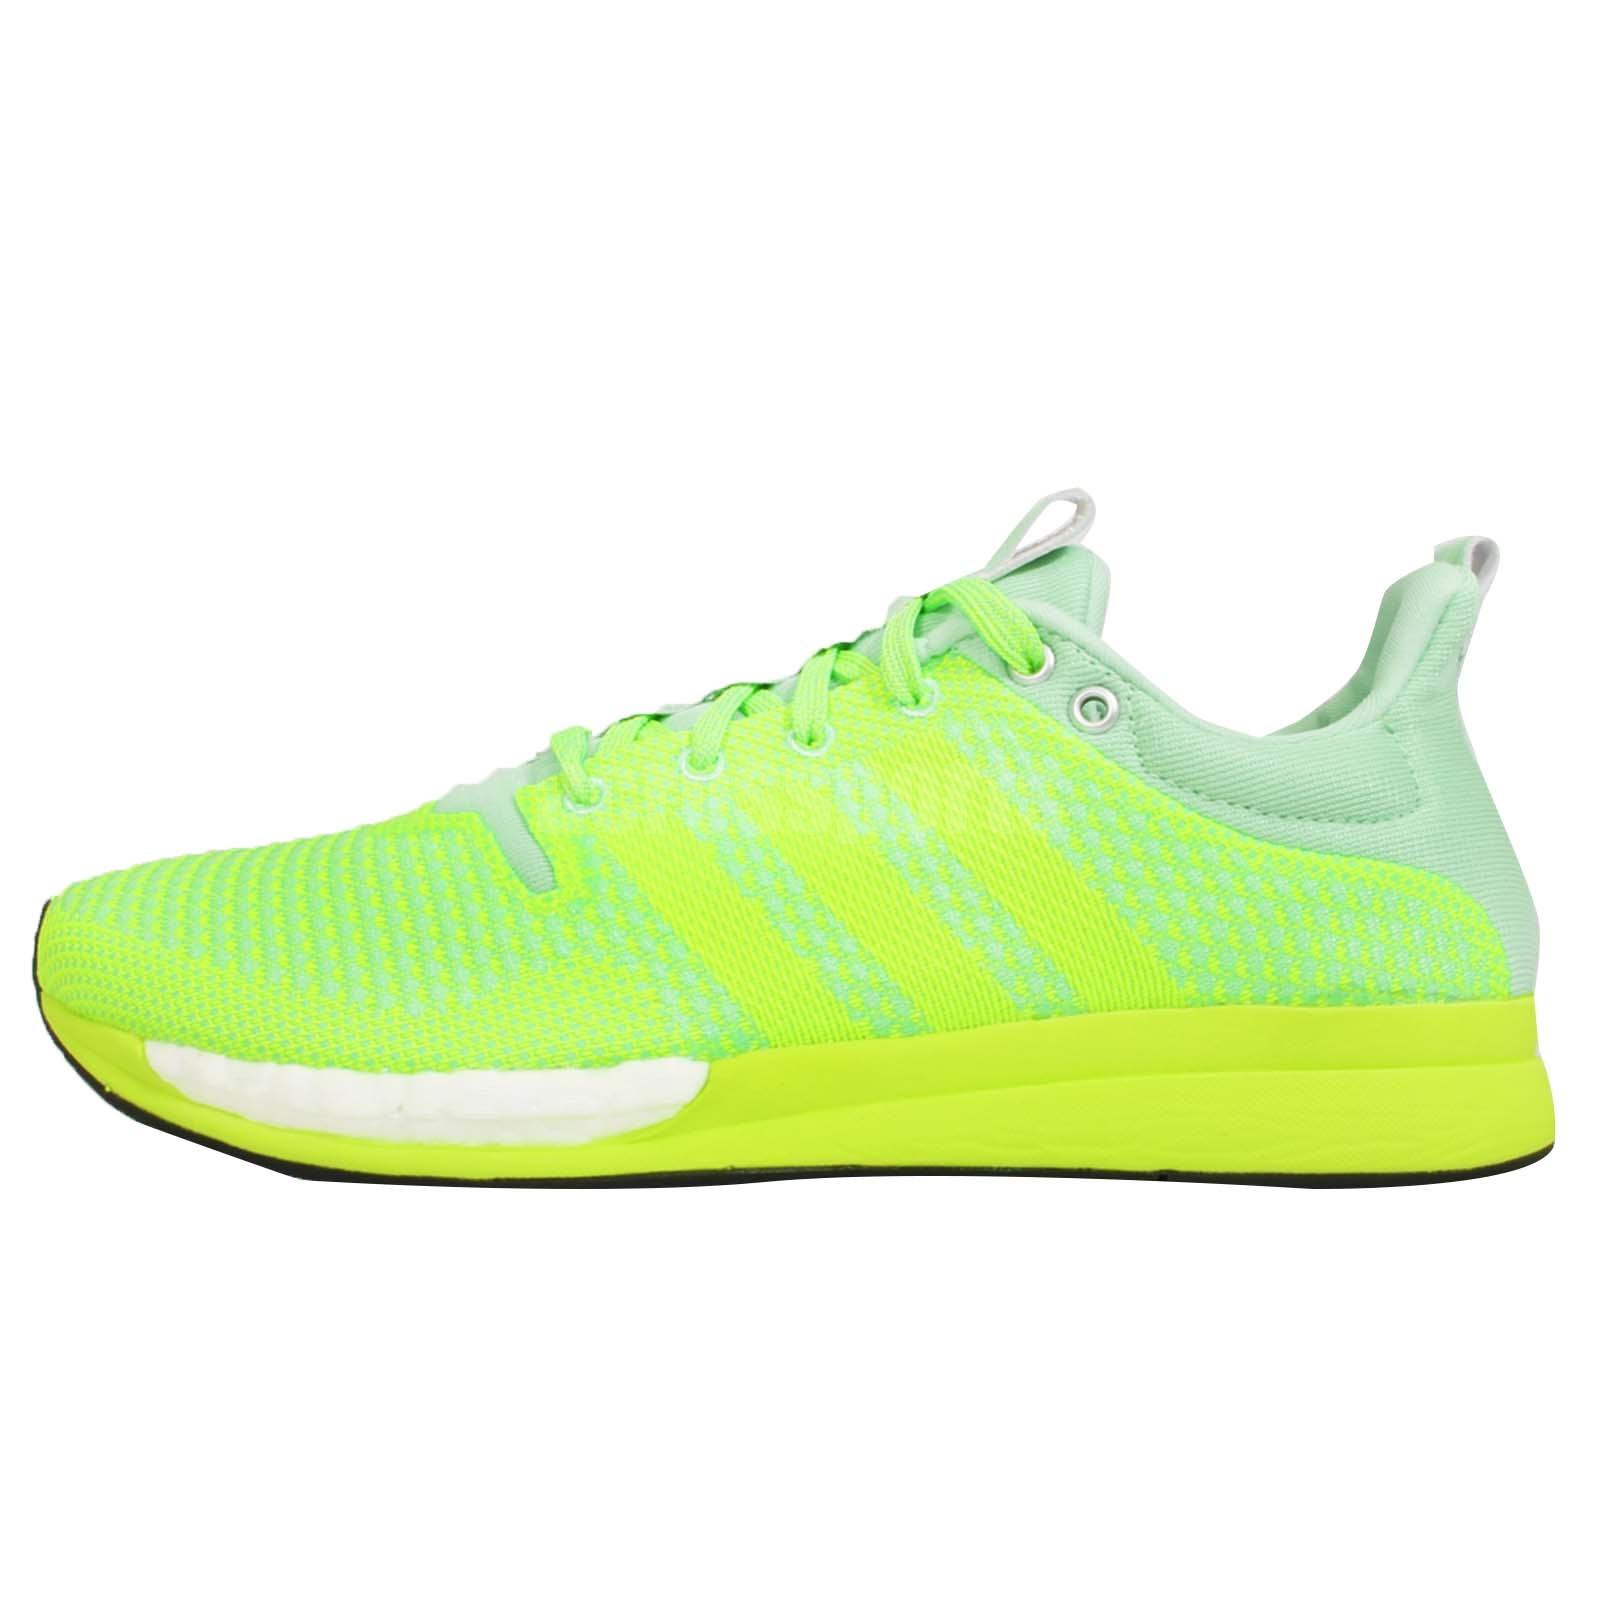 Adidas Adizero Feather Boost W Green Yellow Womens Running